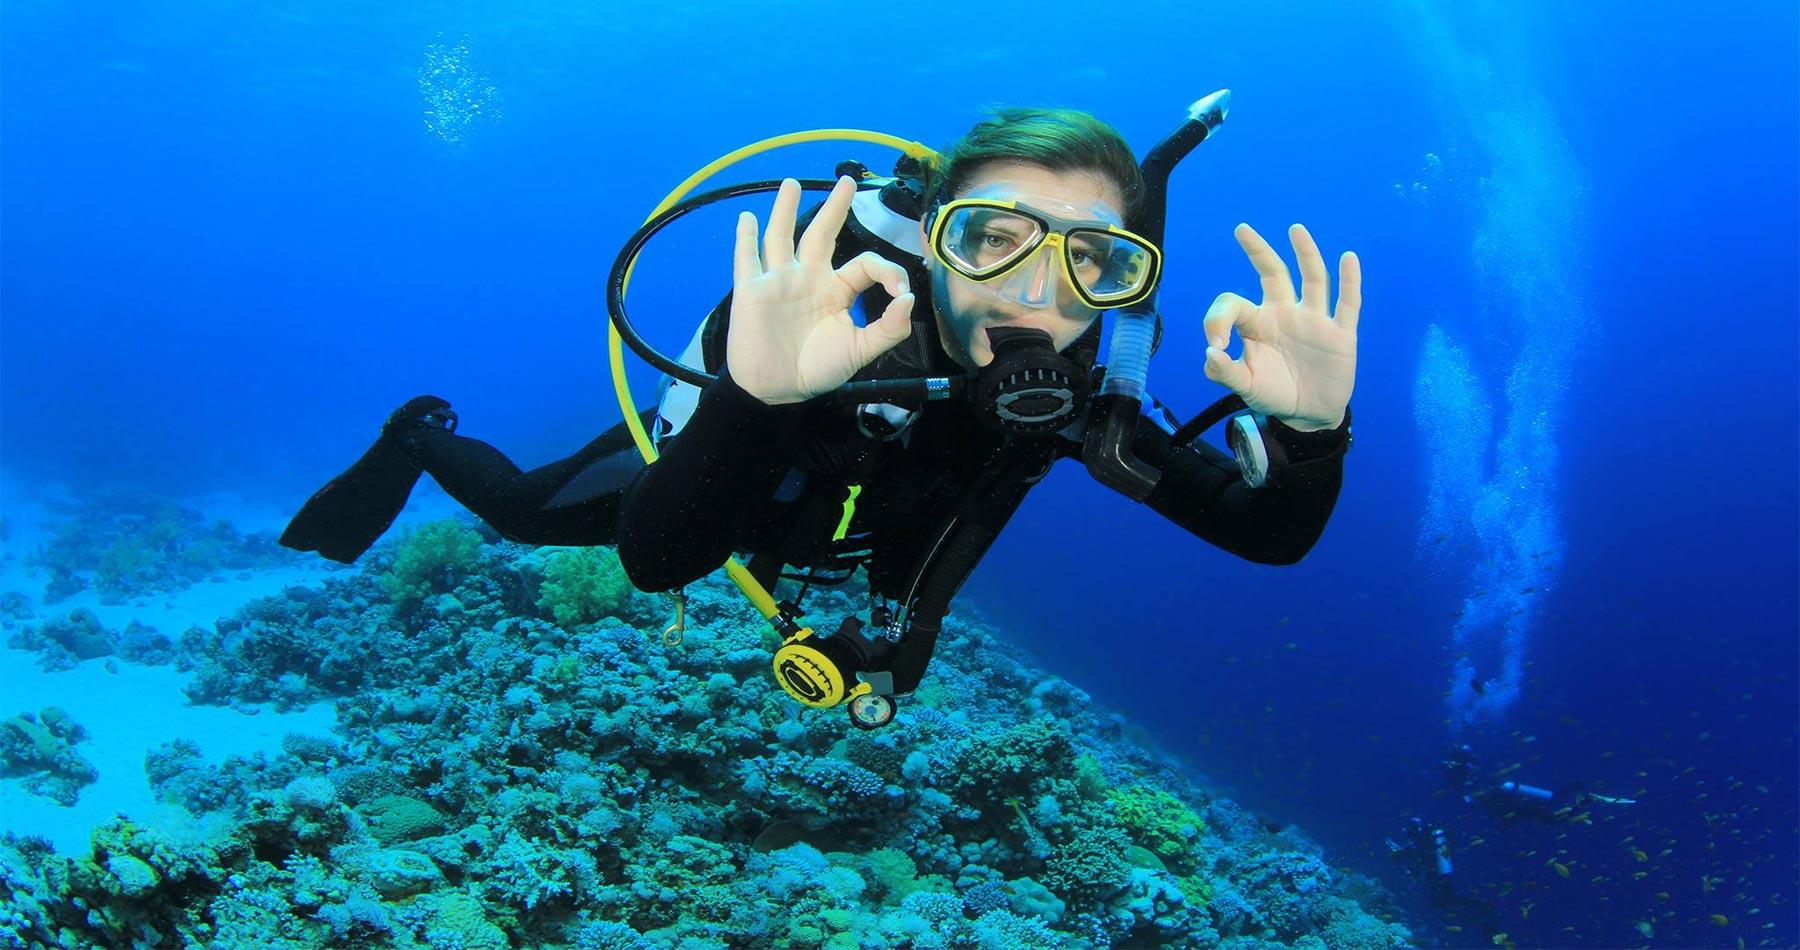 rhodes experiences h2o diving 2